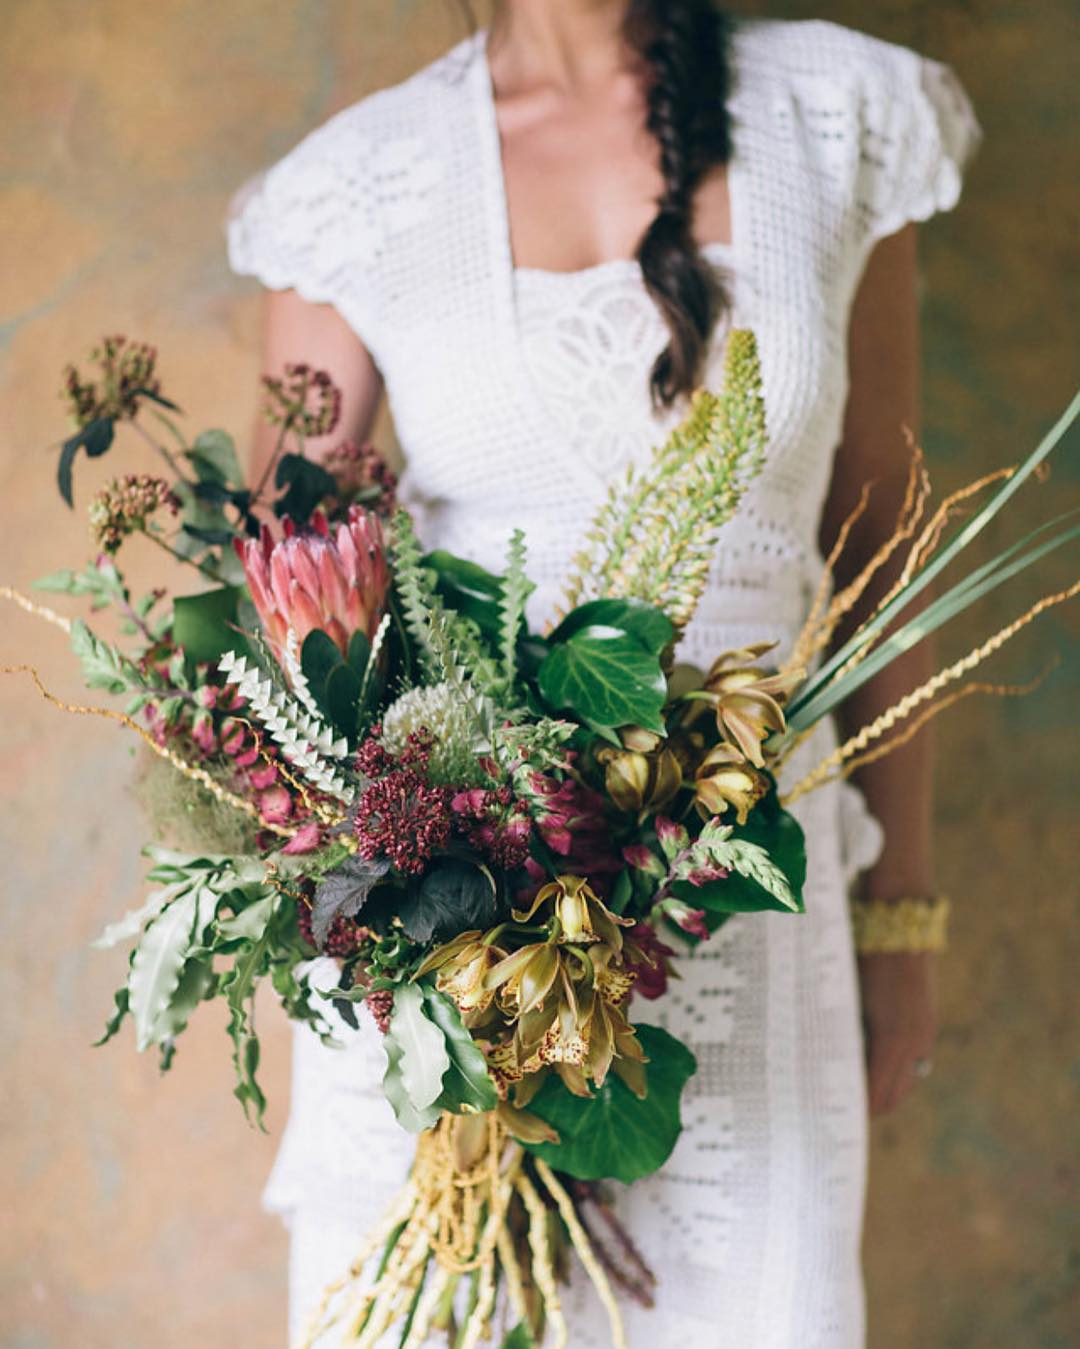 {swoon} photo | @katepreftakes4  #boho #bohostyle #bouquet #prettyflowers #gold #aldworthmanor #lotusfloraldesigns #photoshoot